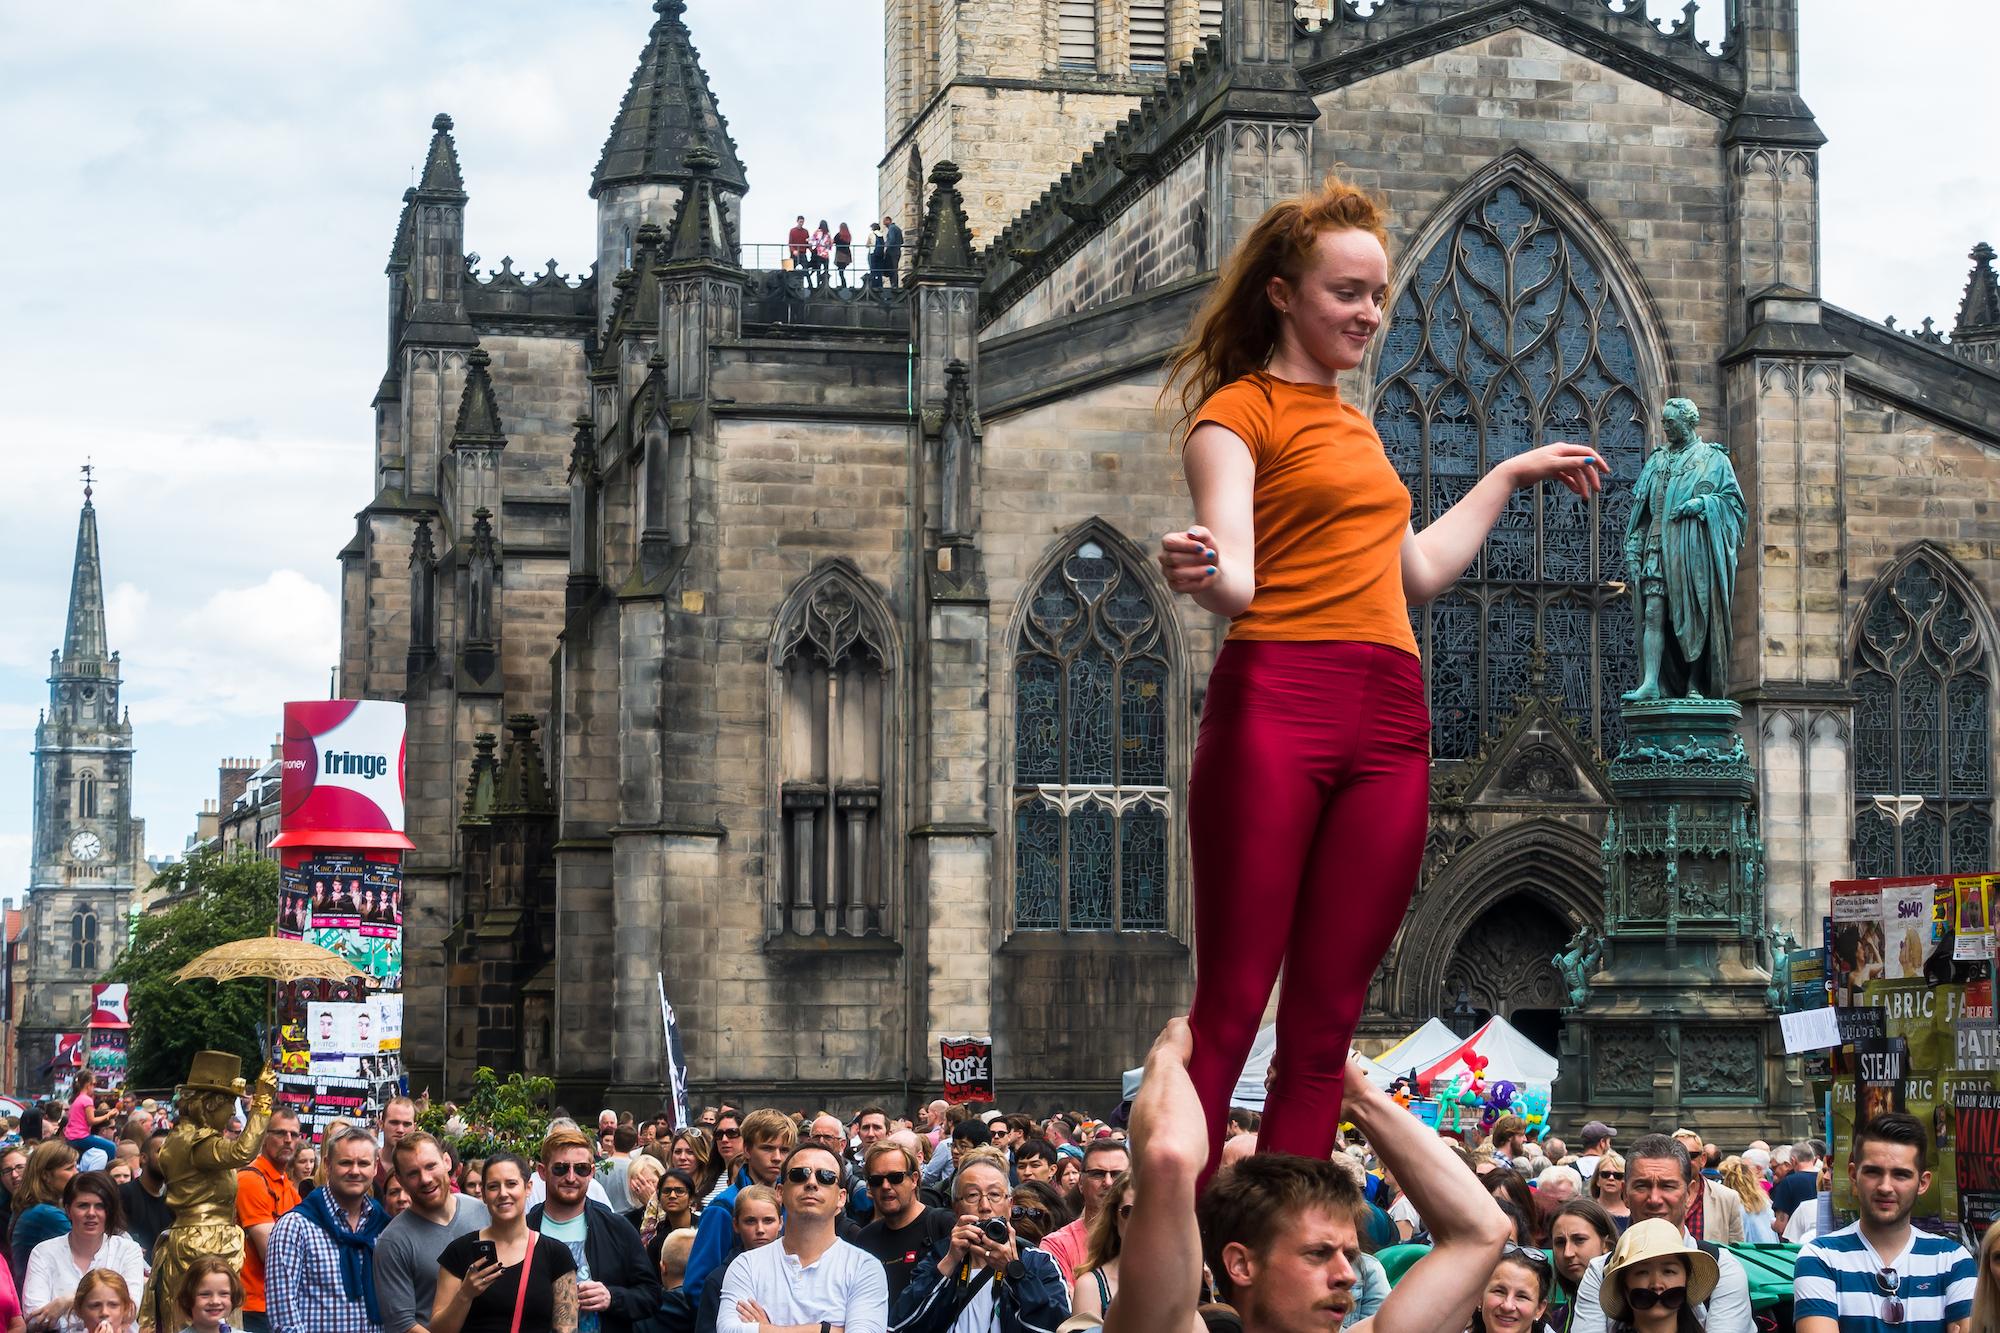 (201) (PO) Acrobatic performers, Royal Mile, Edinburgh Fringe Festival 2016, Scotland.jpg